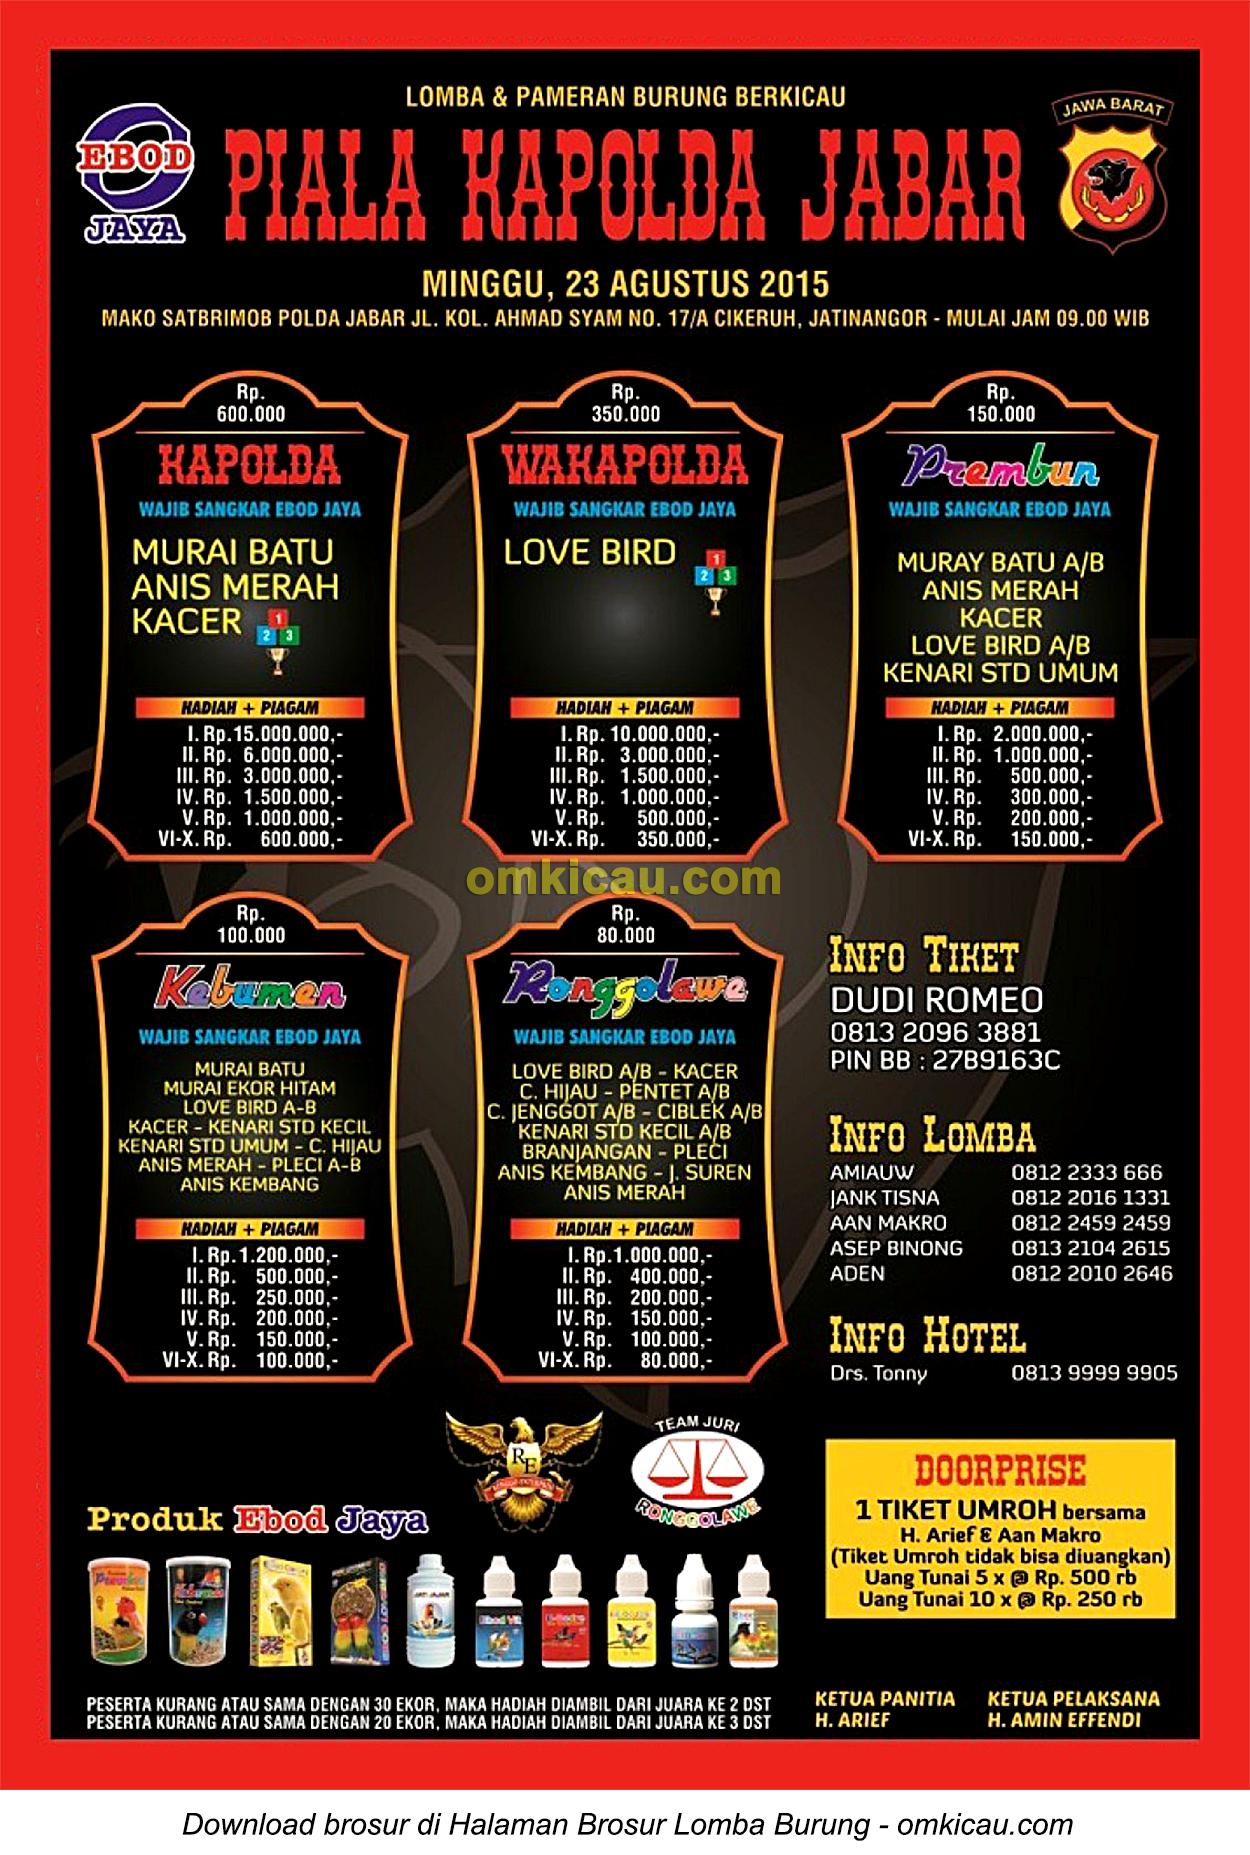 Brosur revisi Lomba Burung Berkicau Piala Kapolda Jabar, Sumedang, 23 Agustus 2015